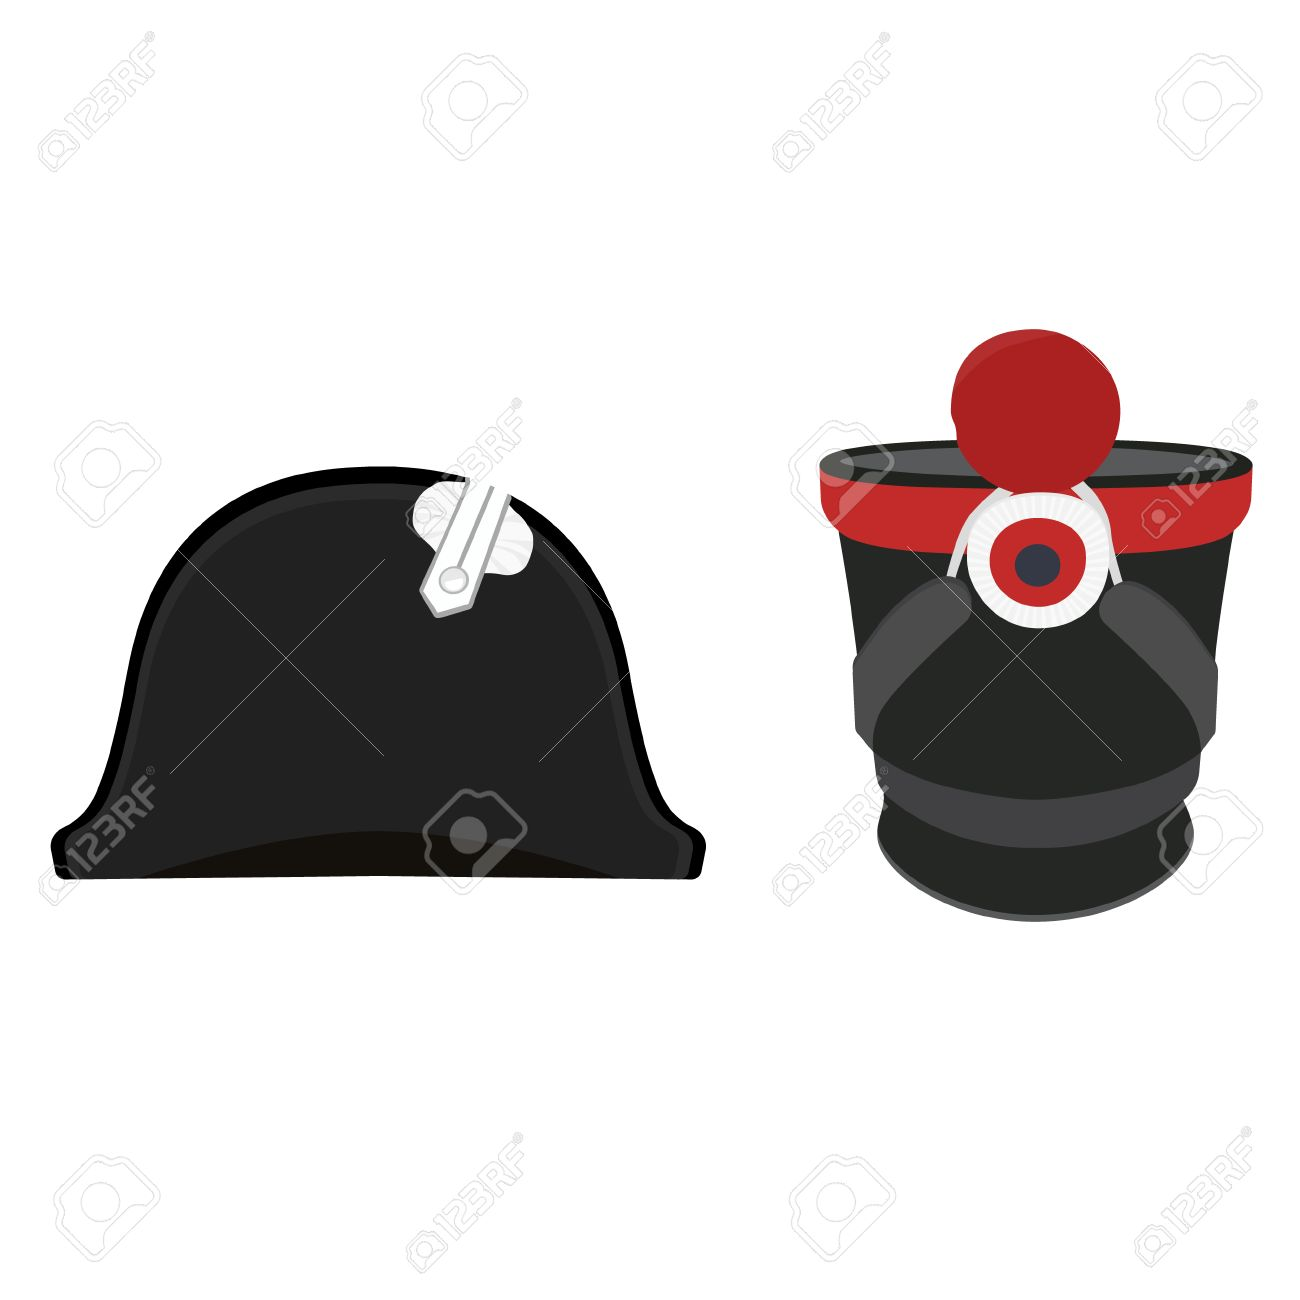 ec1f030b5b1 Vector - Vector illustration black Napoleon Bonaparte hat and cylindrical  military cap. Infantry shako hat. General bicorne hat